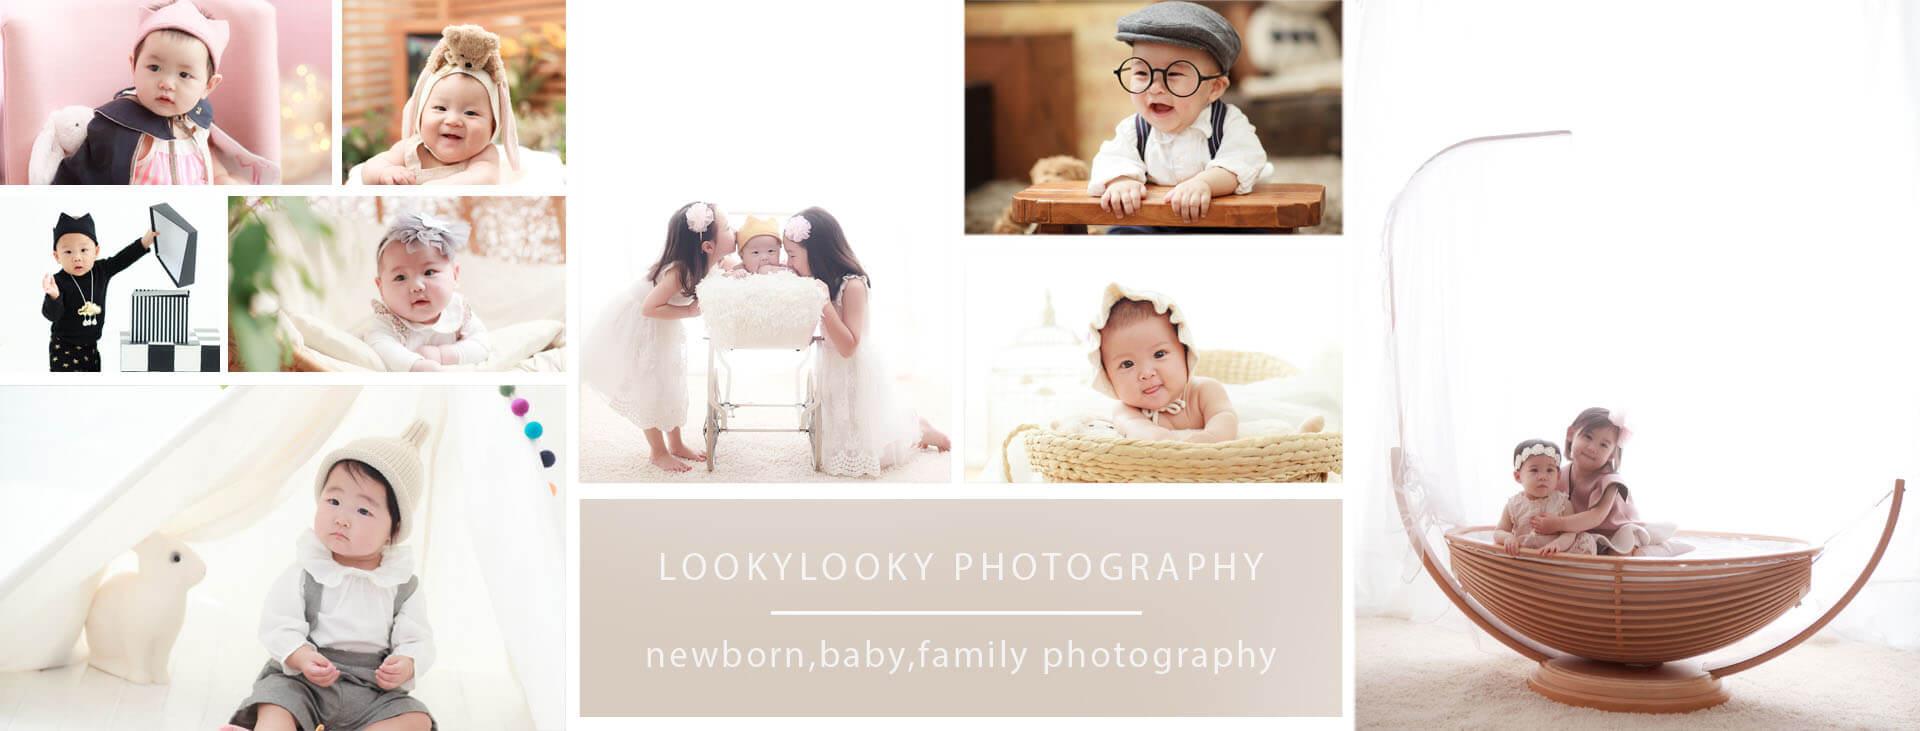 Newborn photography sydney baby photography sydney baby photo